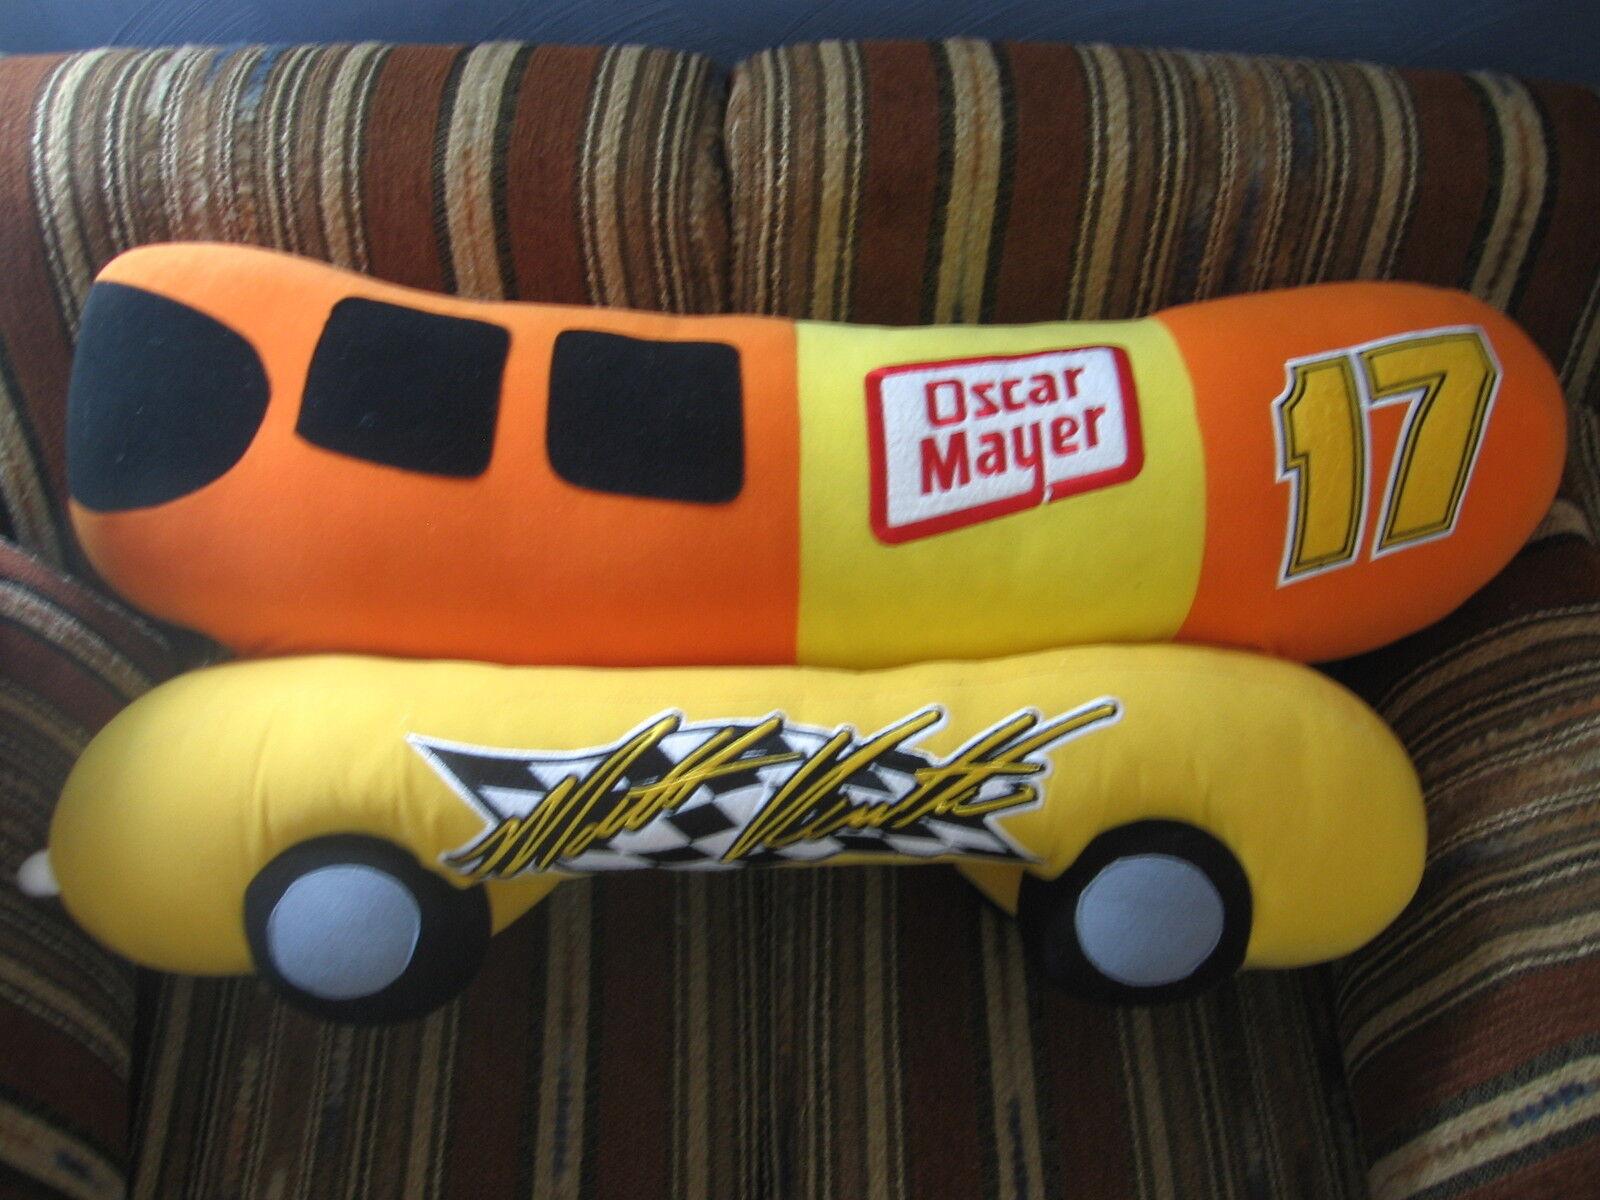 32  plush Jumbo Wiener Mobile Matt Kenseth, from Nascar, good condition RARE